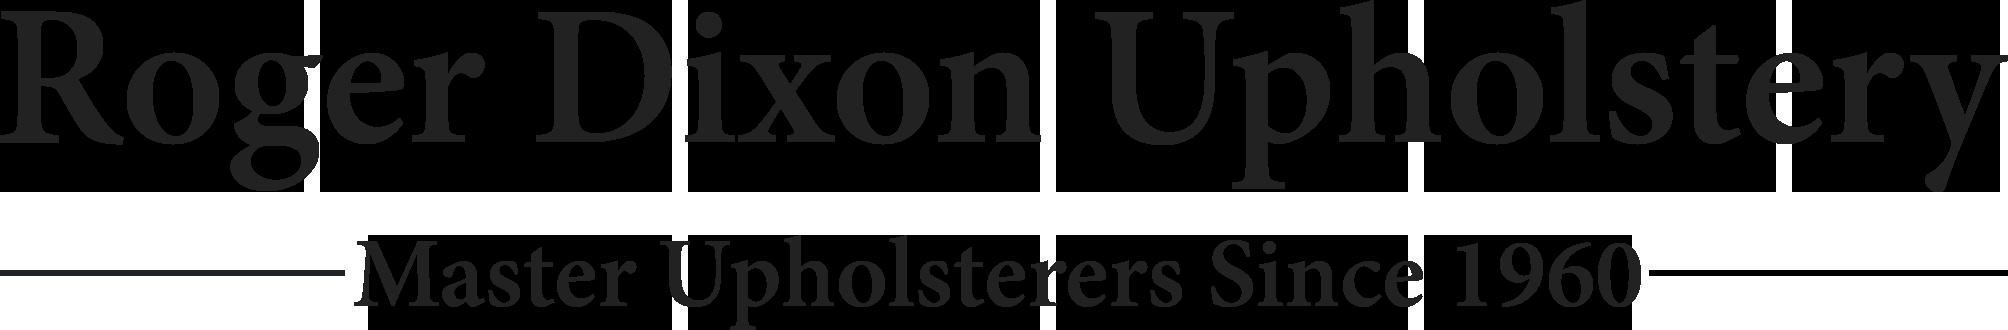 Roger Dixon Upholstery